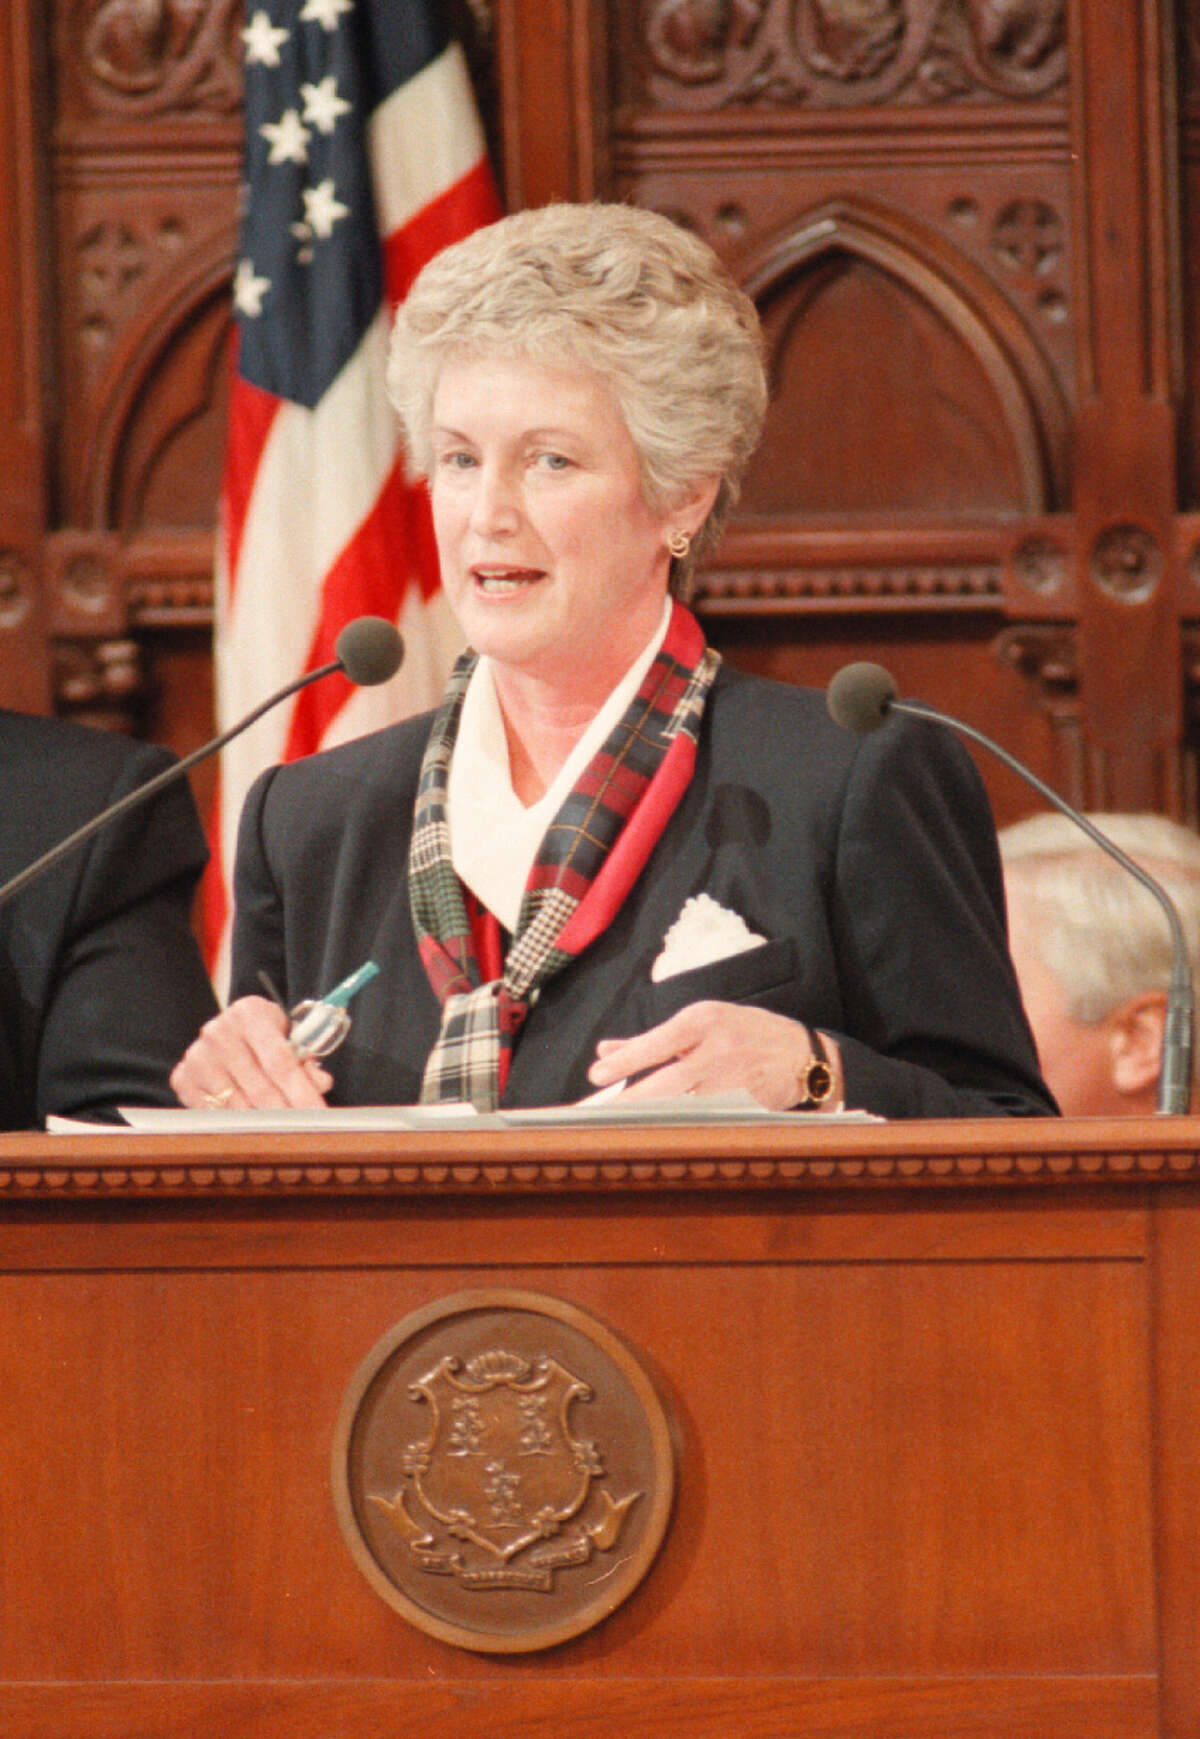 File 01/08/97 - Lt. Governor Jodi Rell addresses legislators on opening day of new session